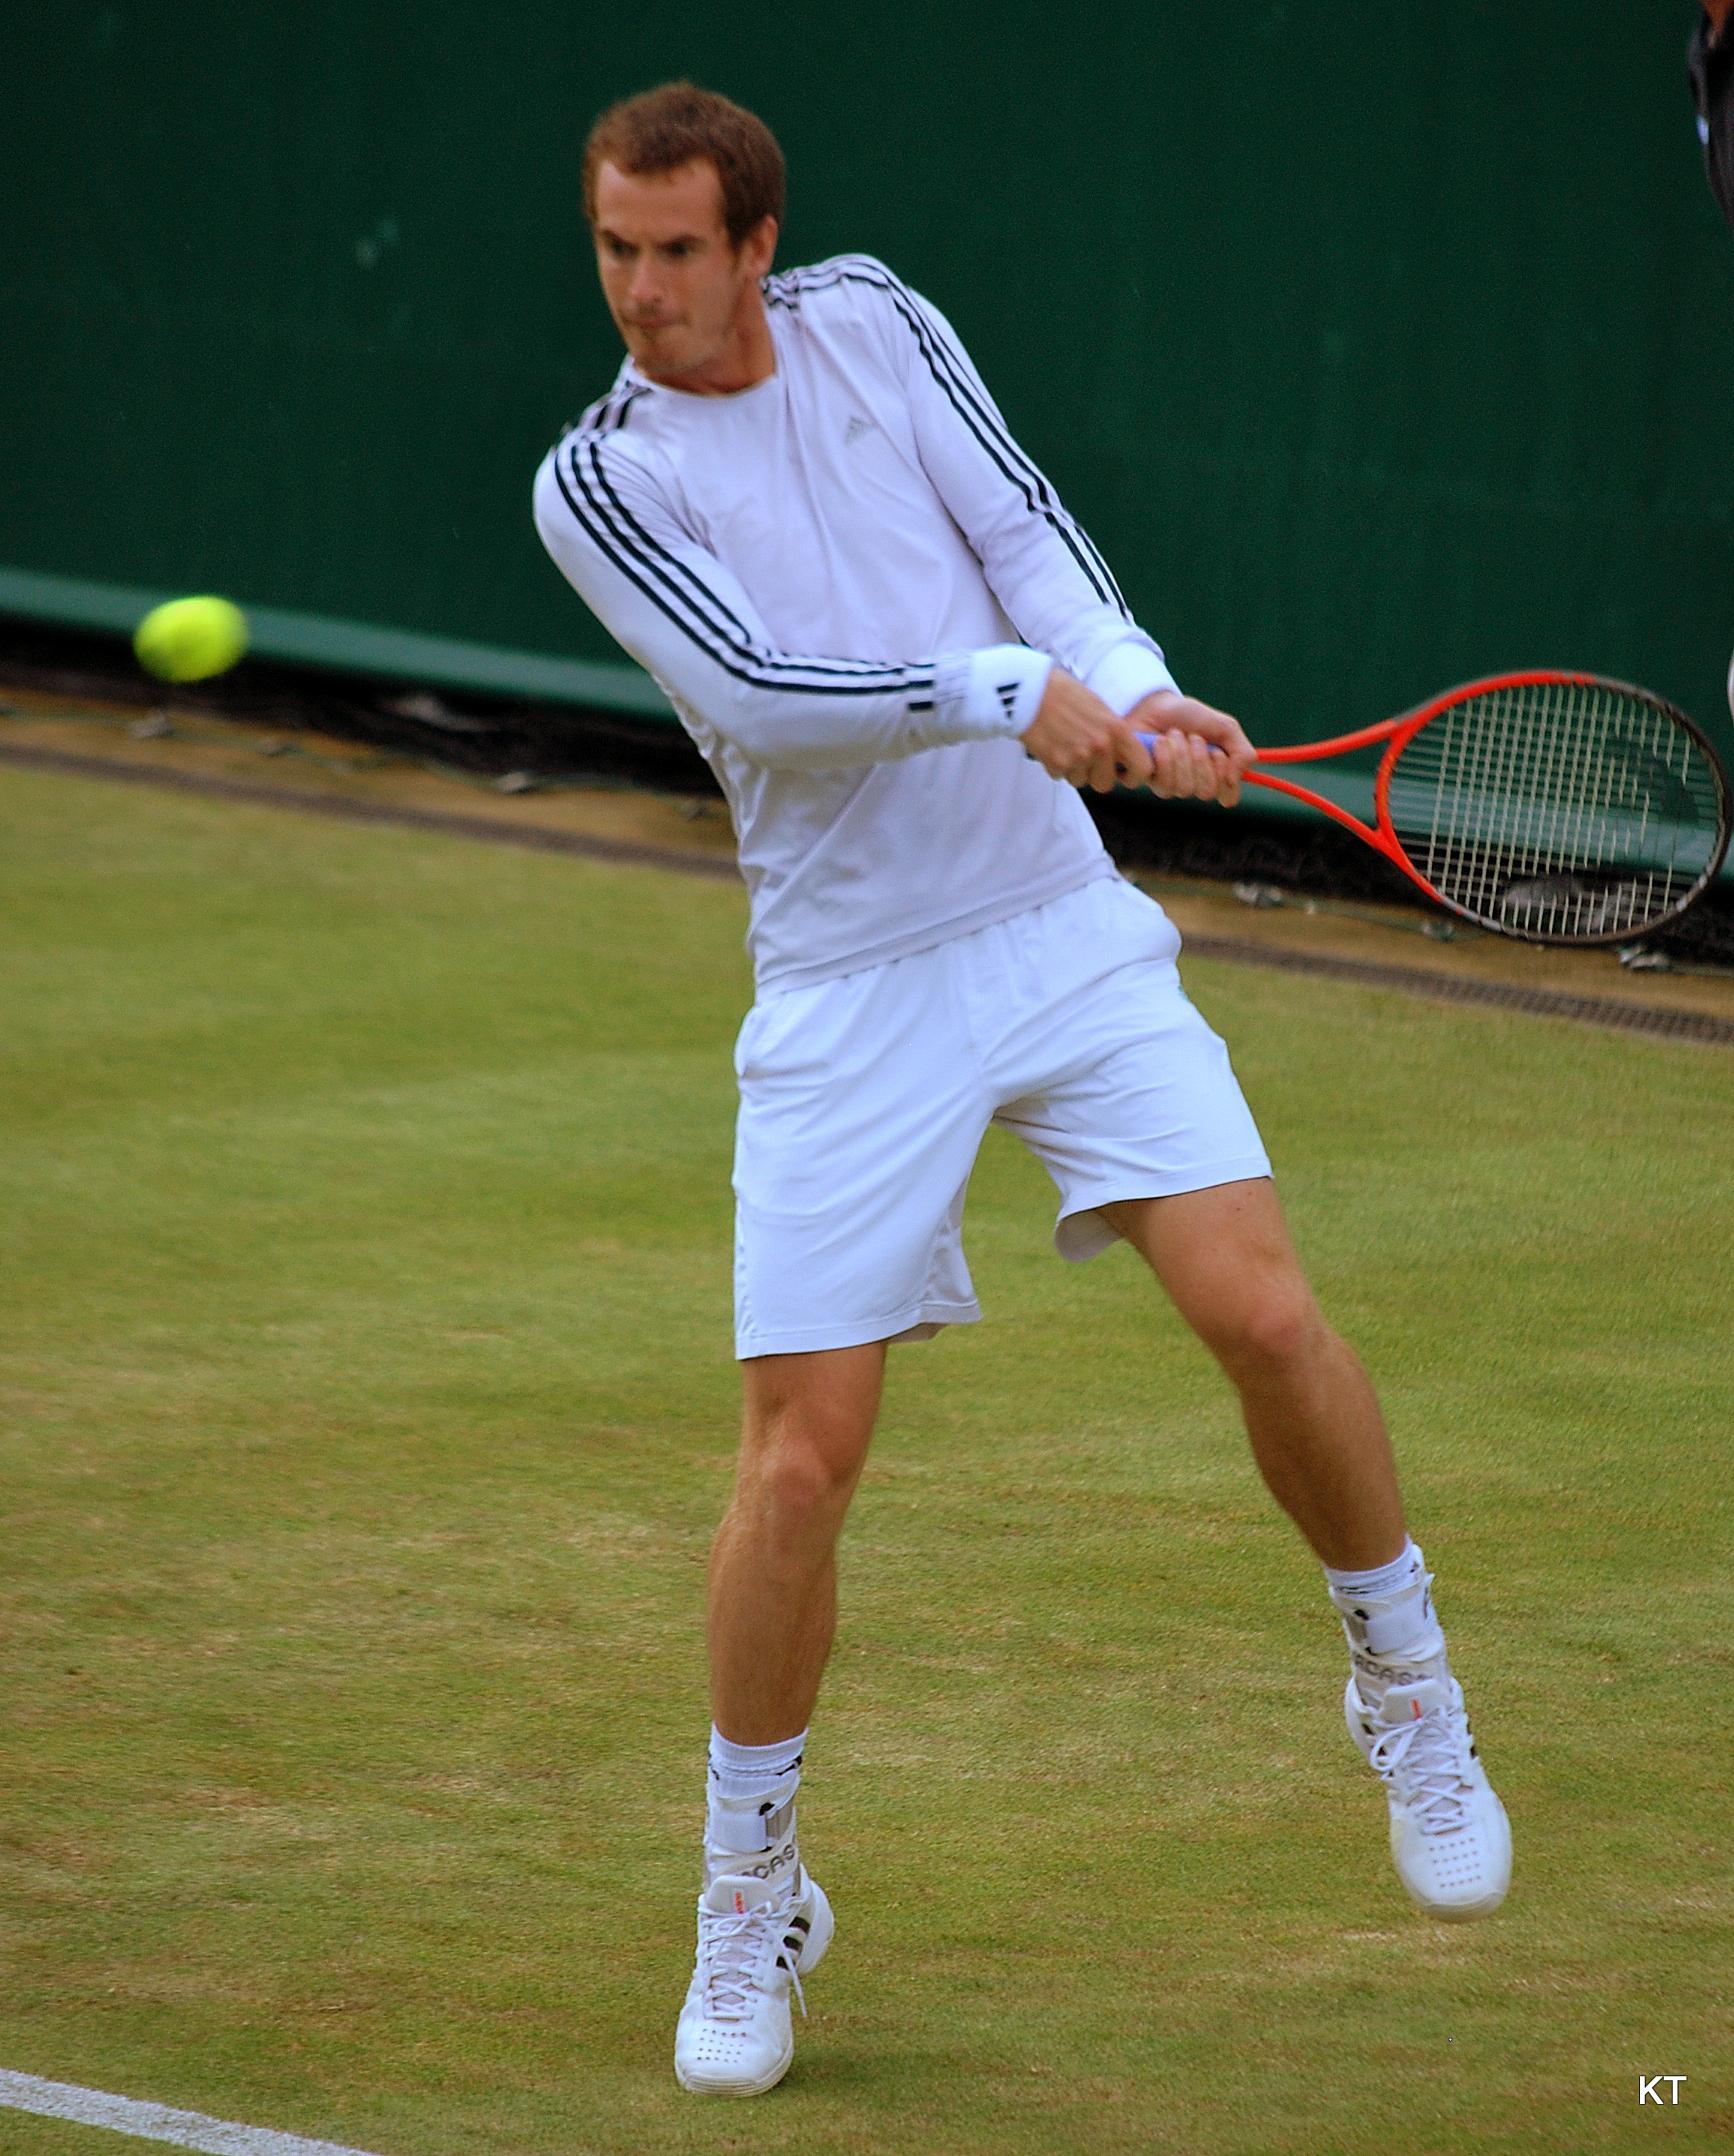 File:Andy Murray (8585140679).jpg - Wikimedia Commons